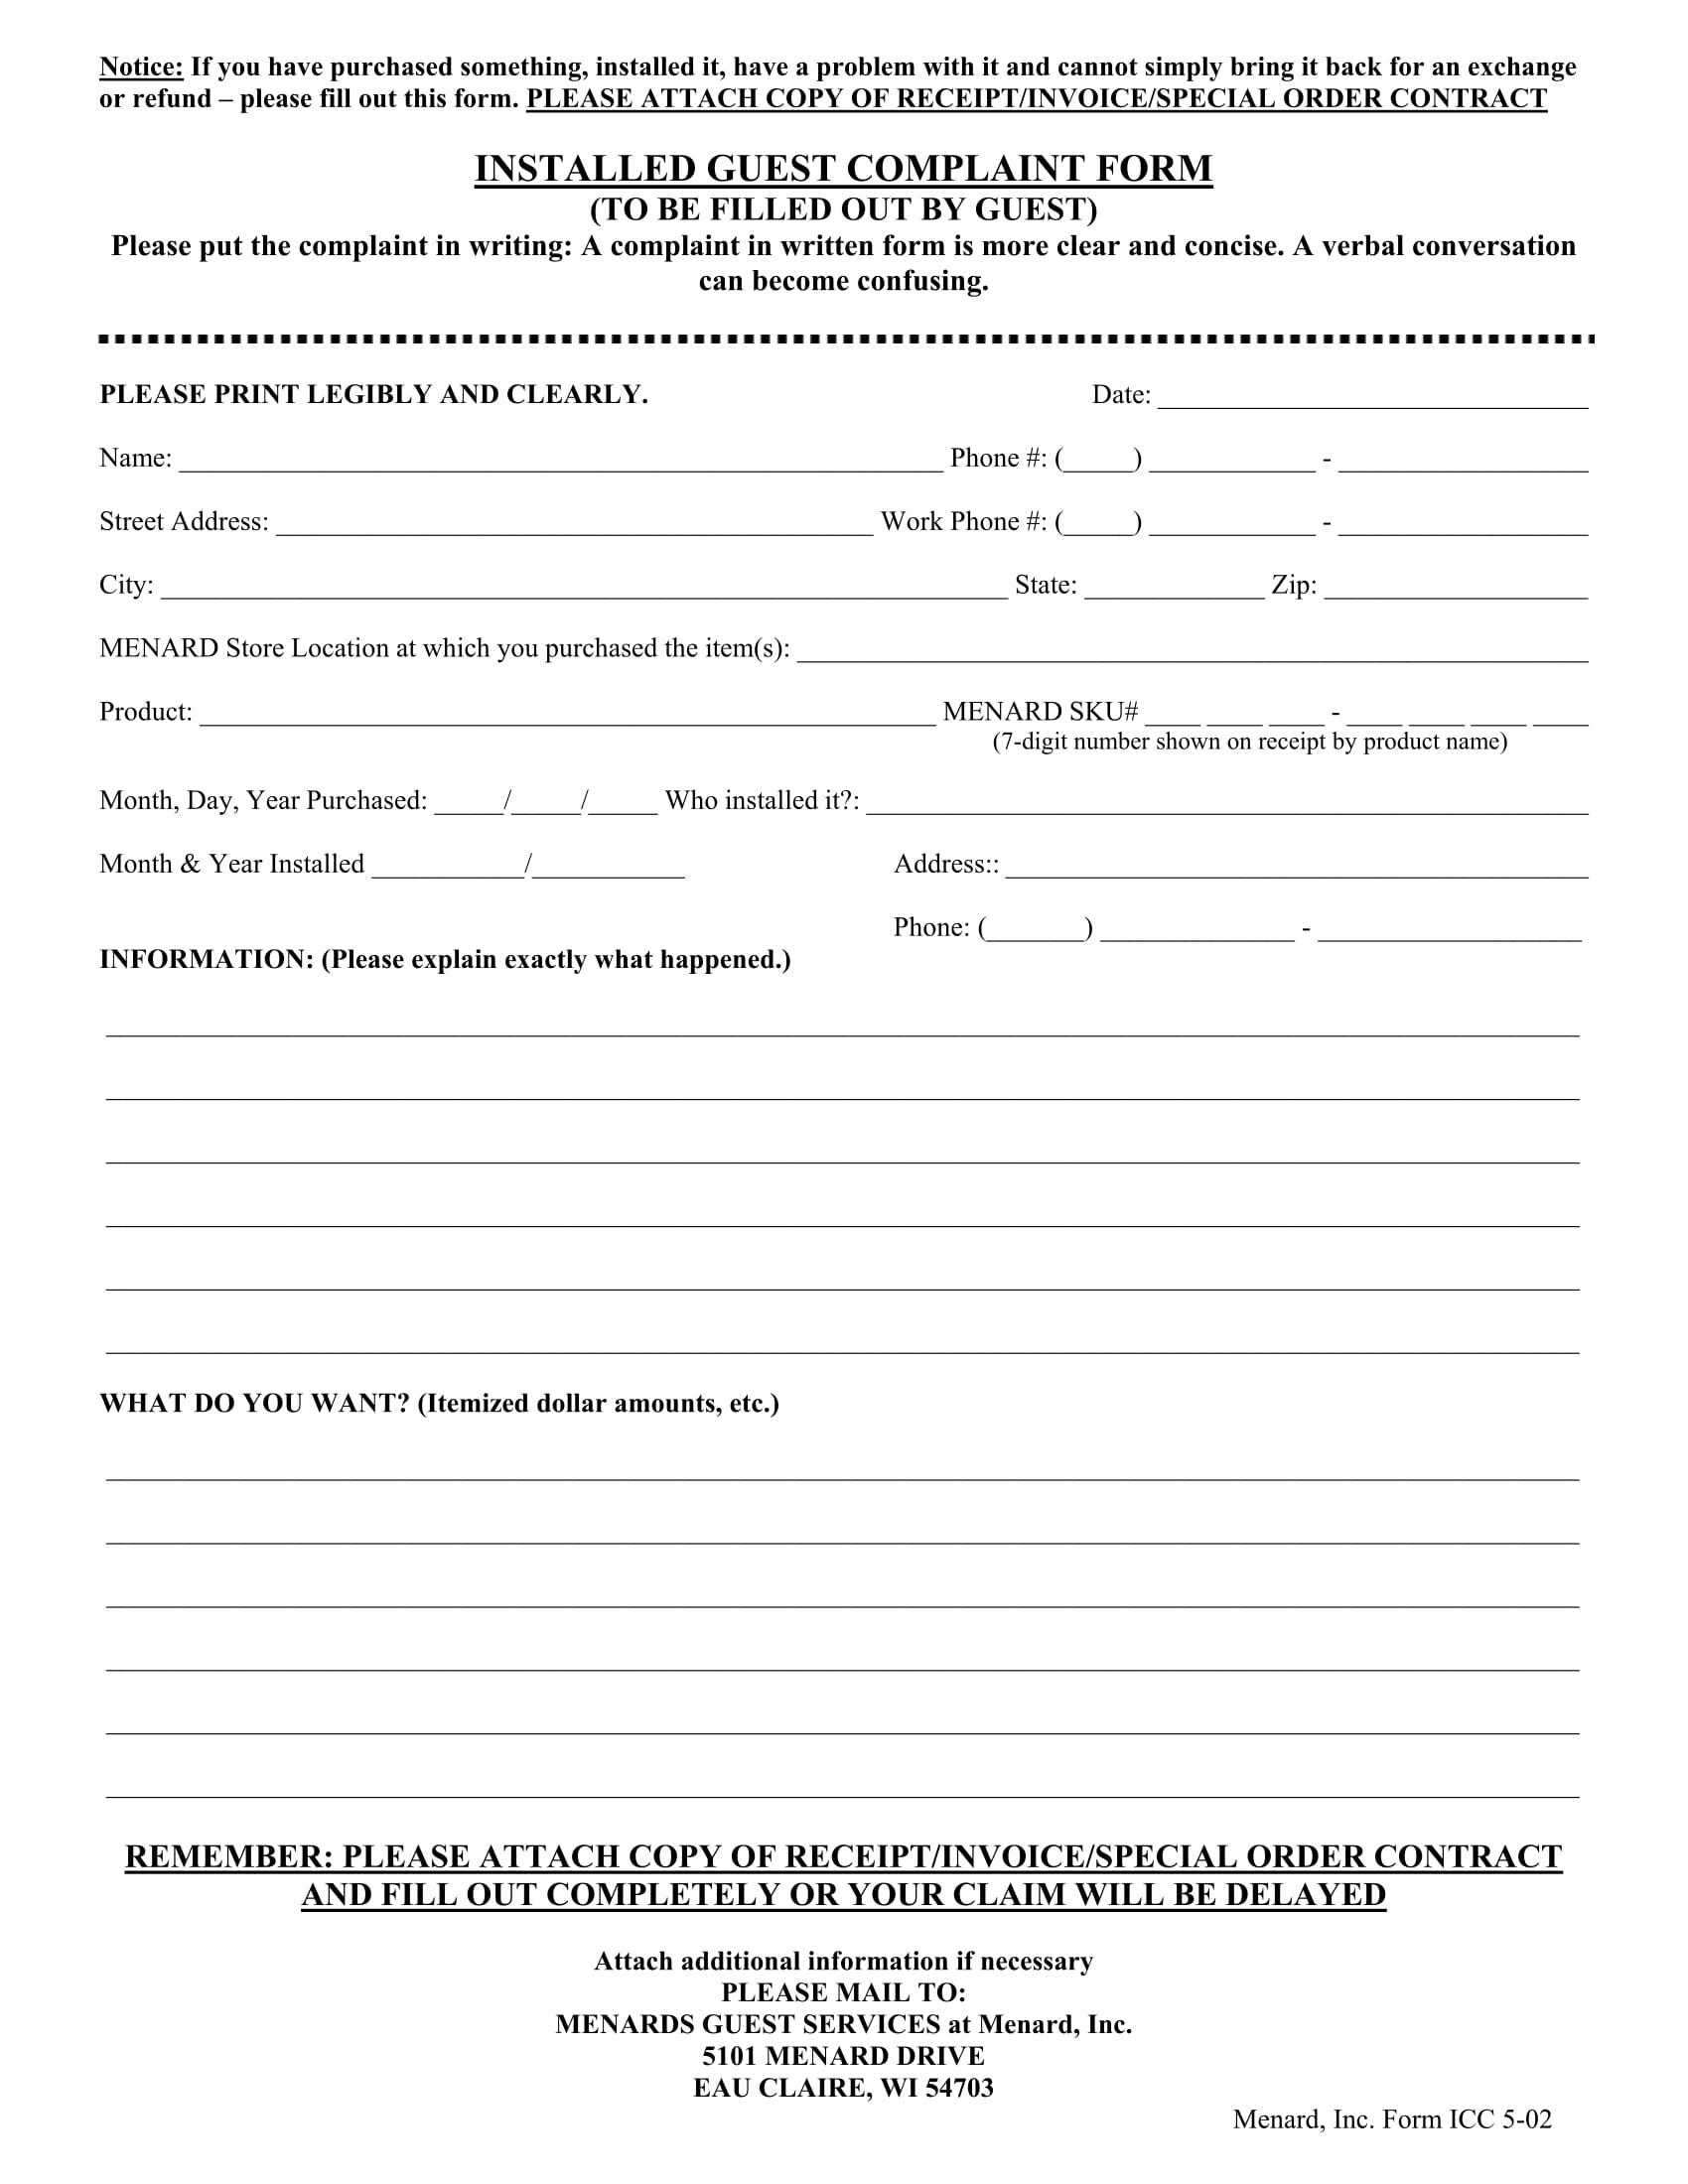 installed guest complaint form 1